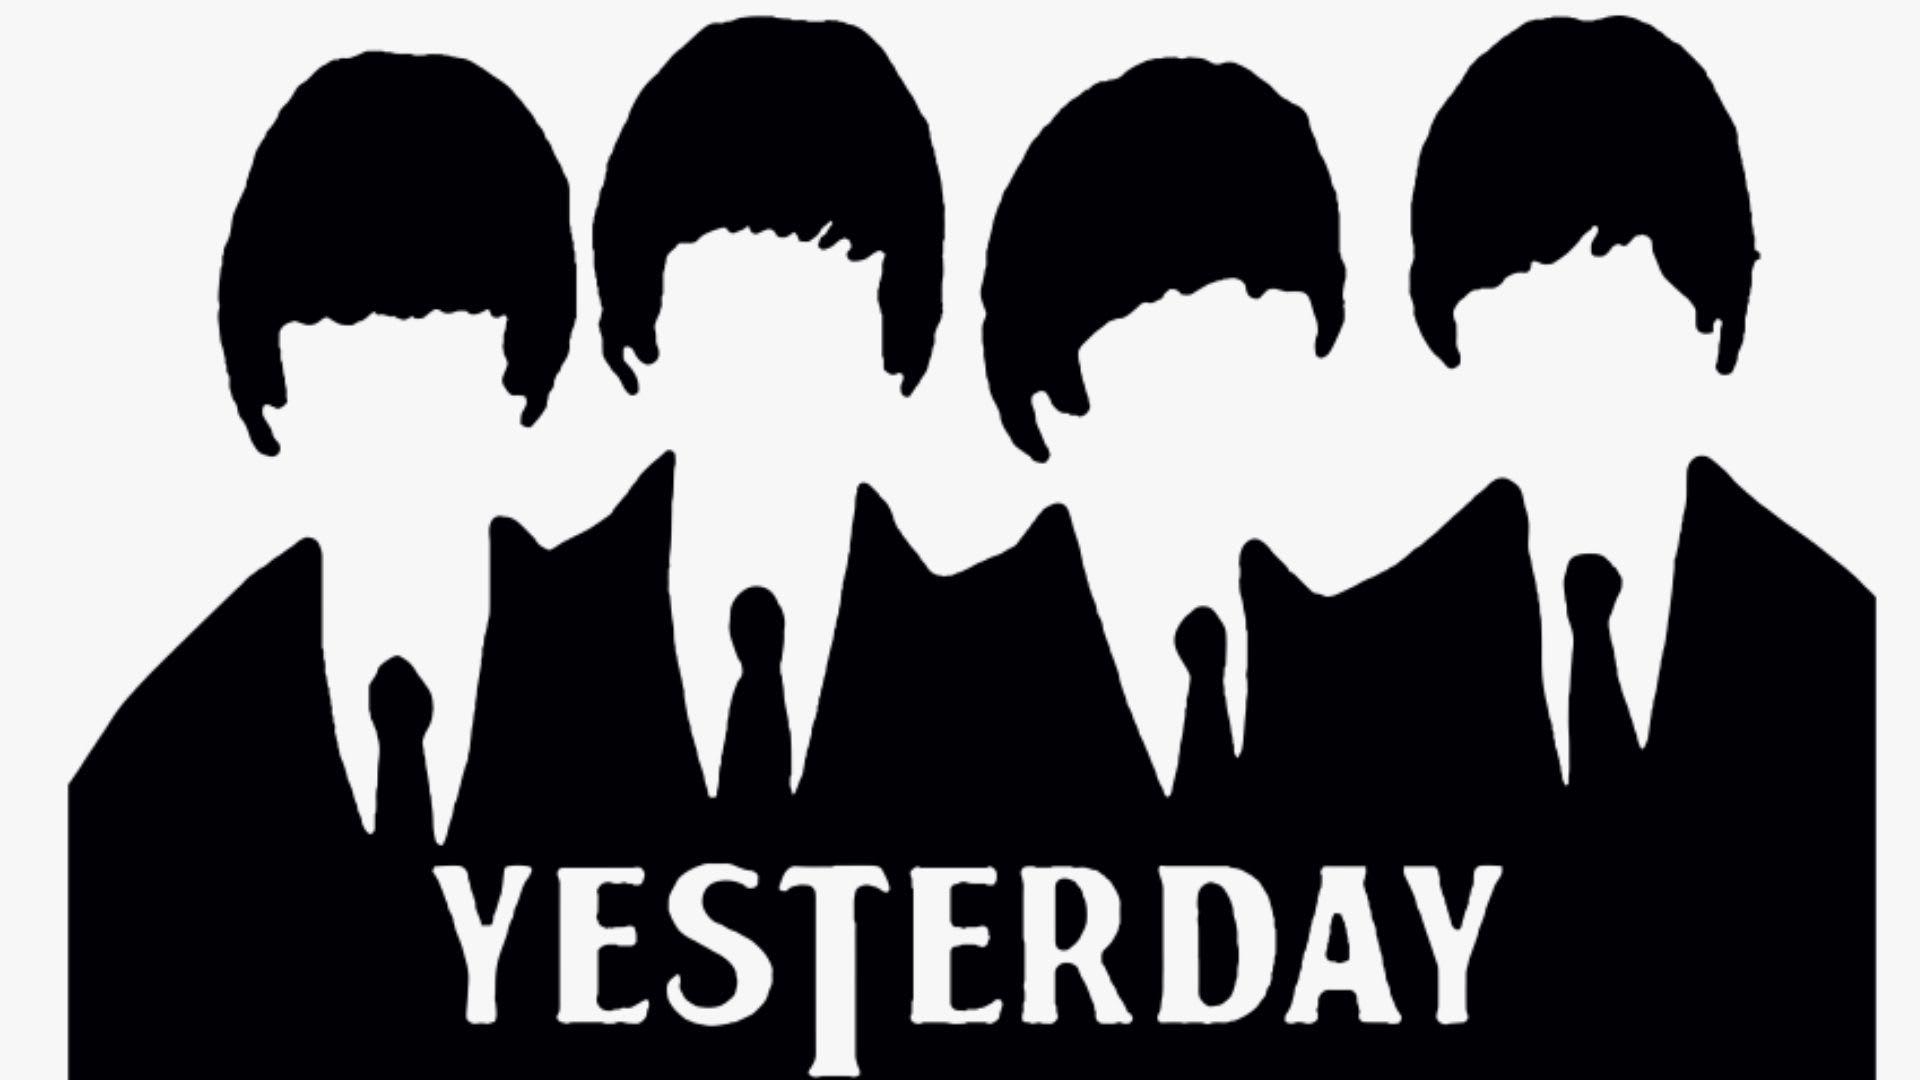 I Beatles ed il loro plagio involontario